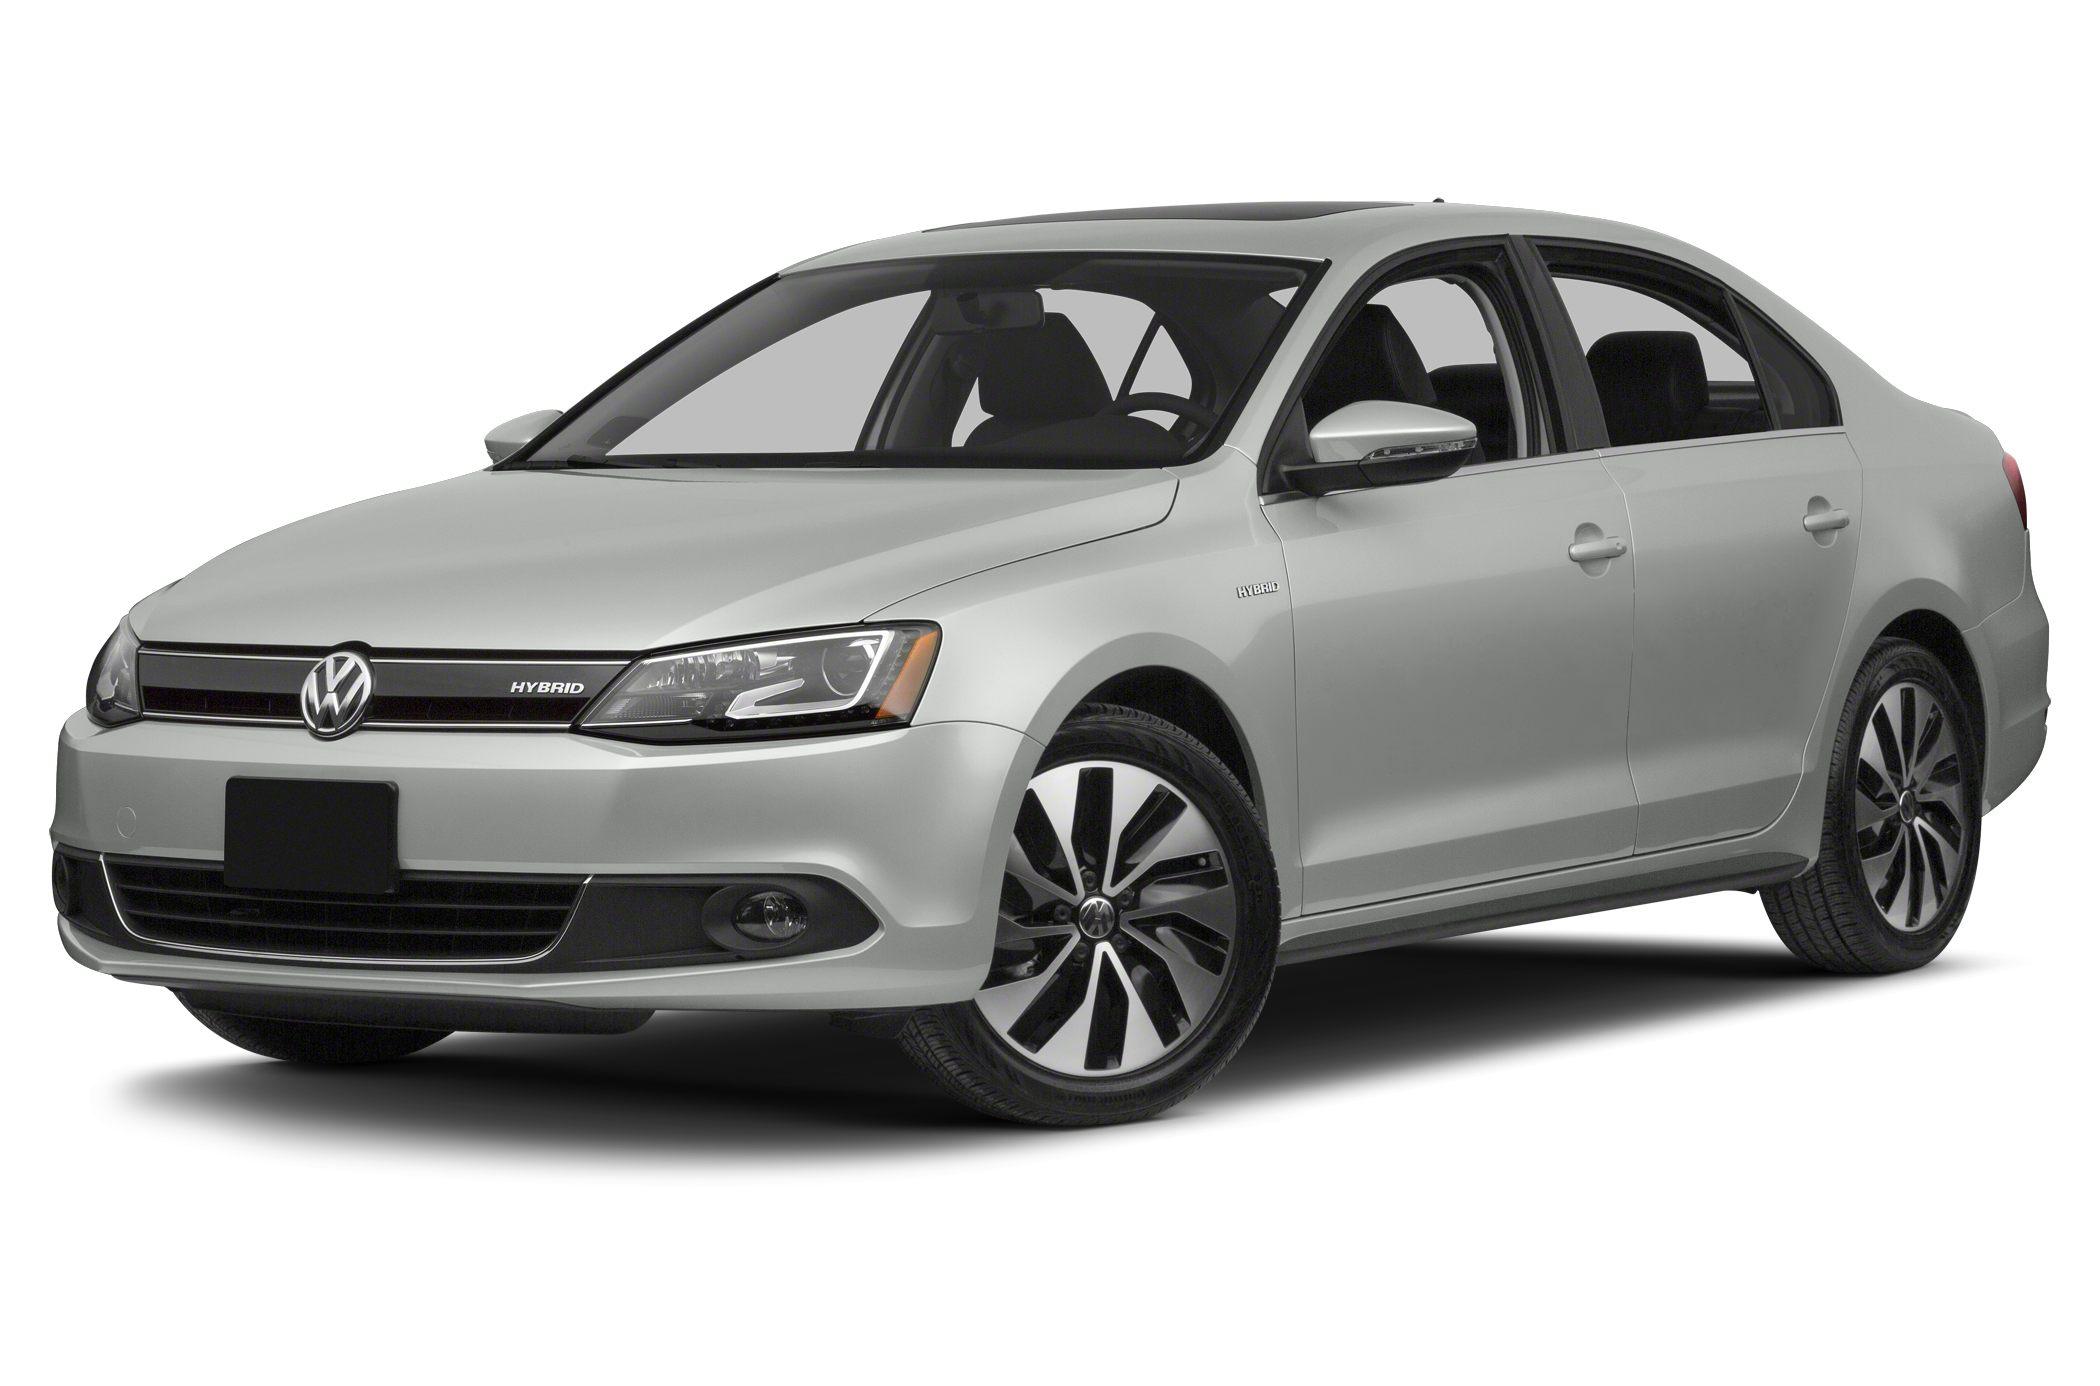 2013 Volkswagen Jetta Hybrid SEL Premium Sedan for sale in Tempe for $20,477 with 17,351 miles.